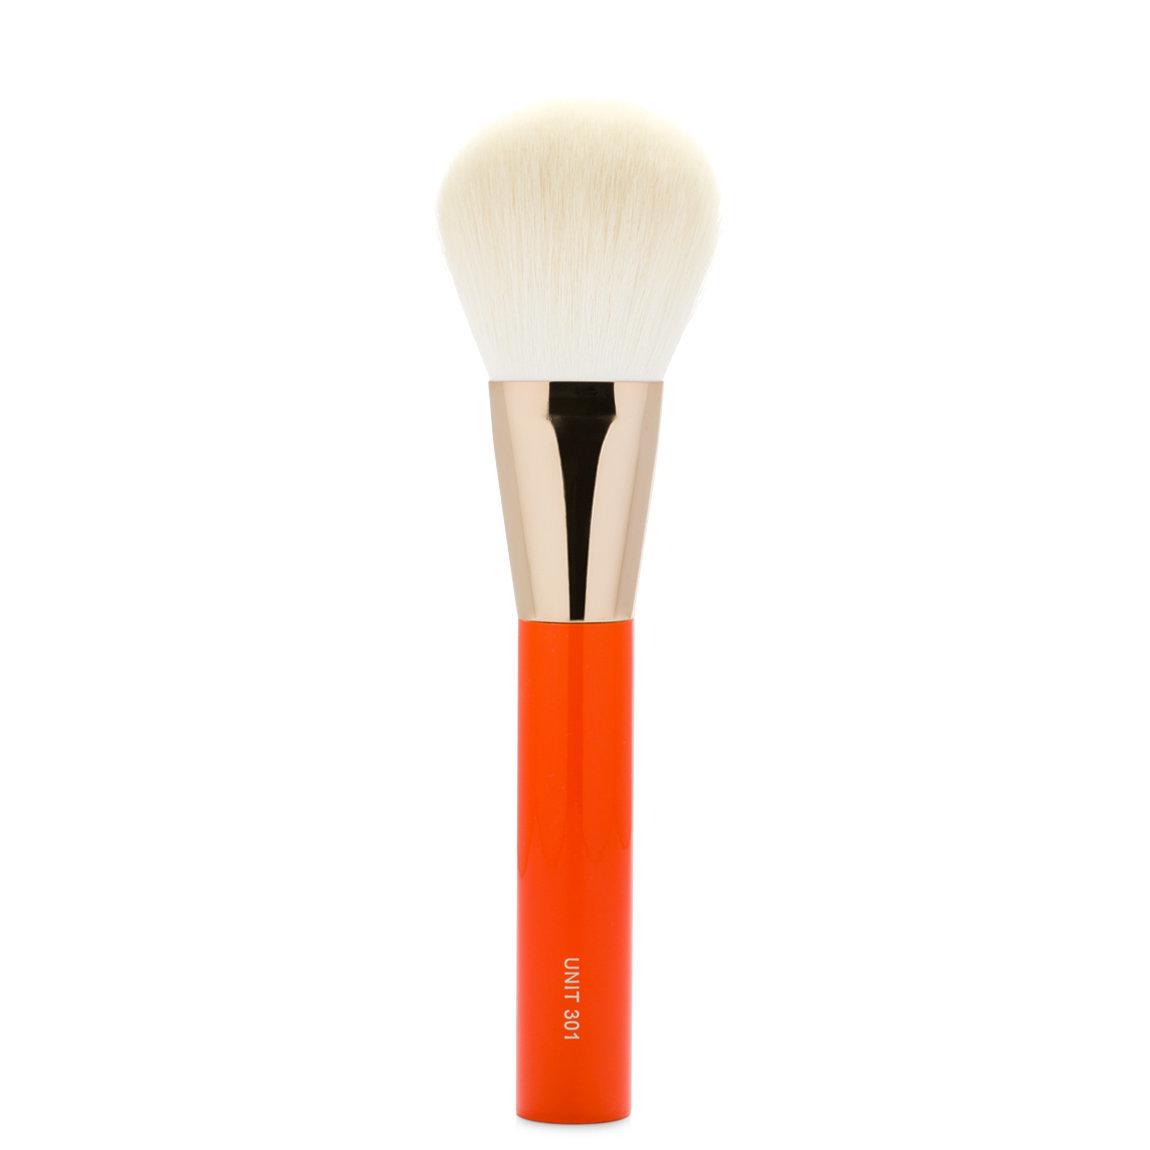 UNITS Orange Series UNIT 301 Large Bronzer Brush alternative view 1 - product swatch.